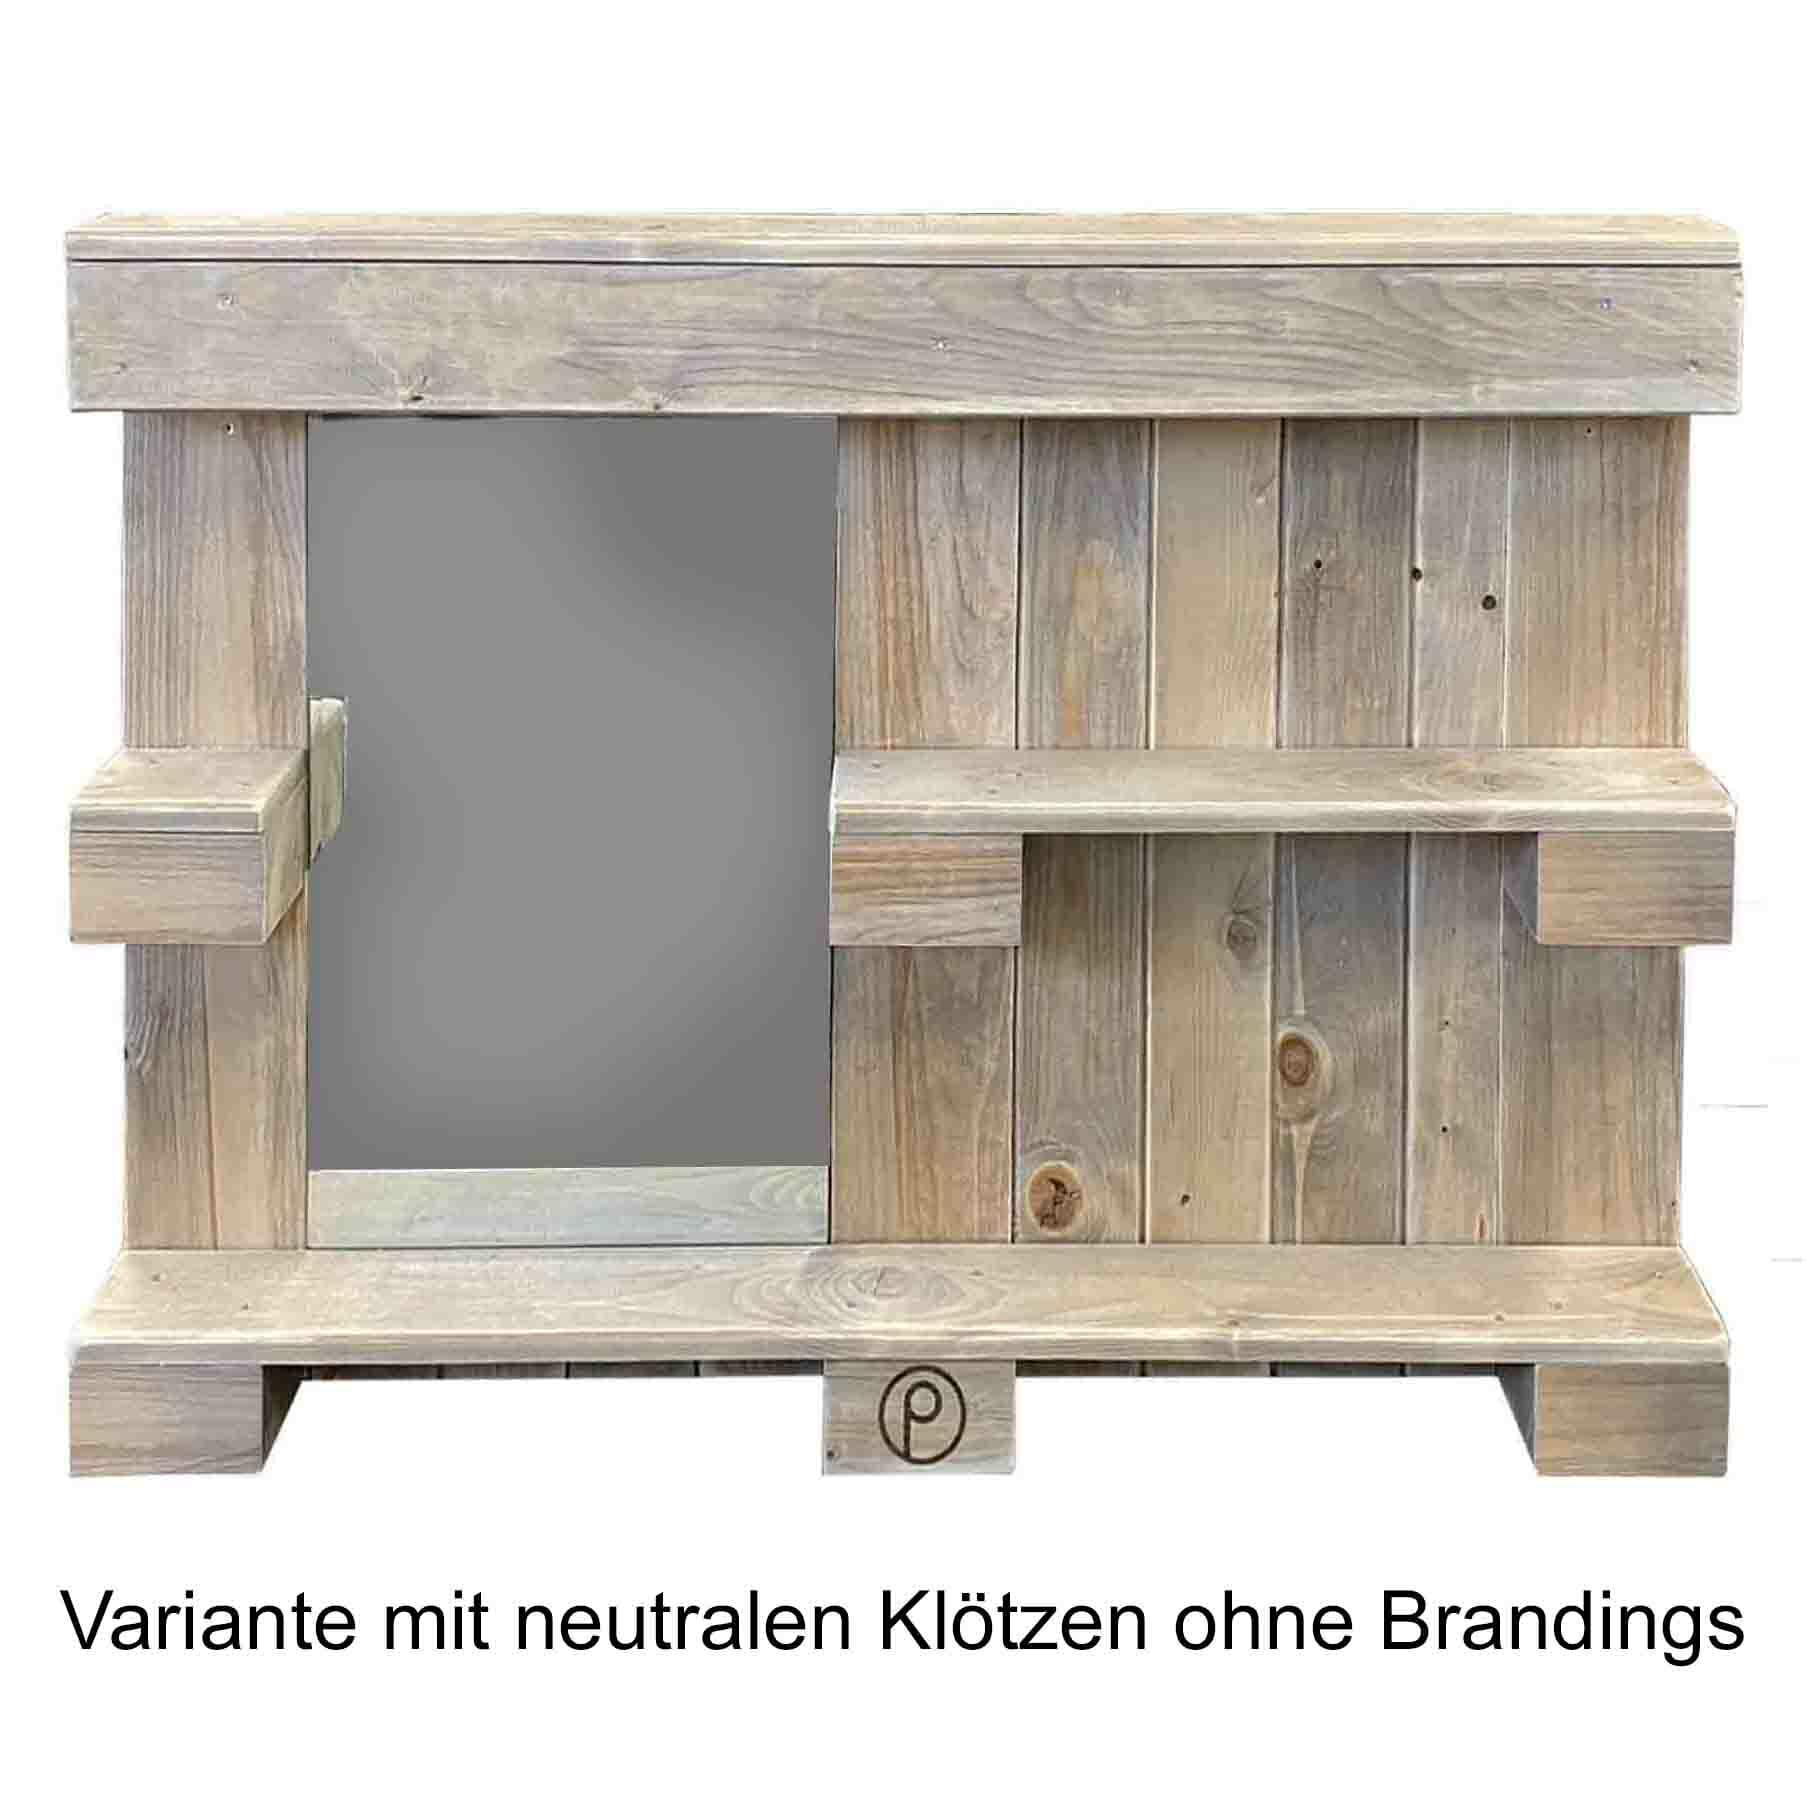 Wandregal - Garderobenregal aus Paletten-Palettenmöbel